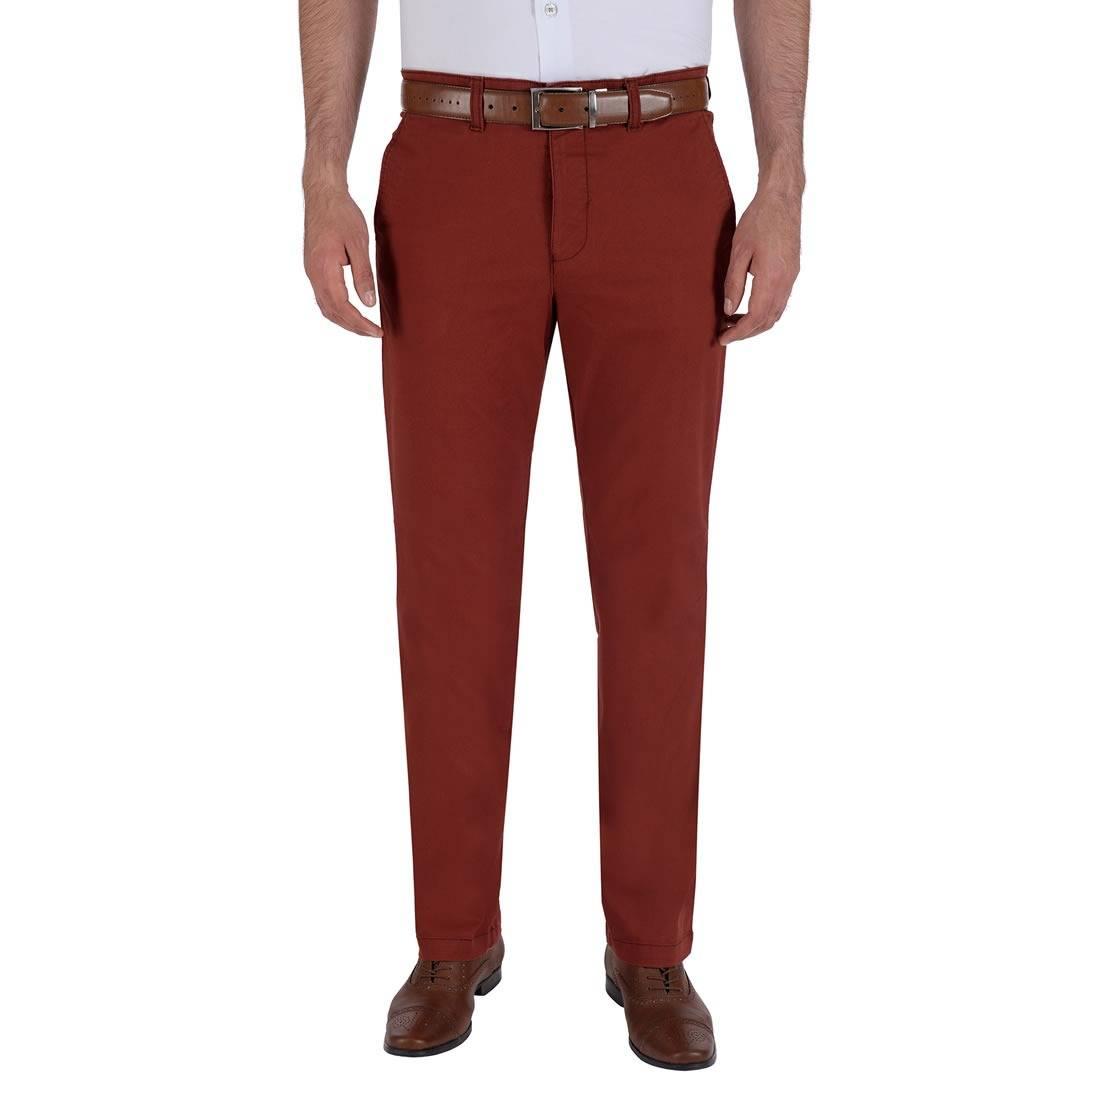 010741097773-01-Pantalon-Casual-Collection-Slim-Fit-Con-Elastano-Shedron-yale